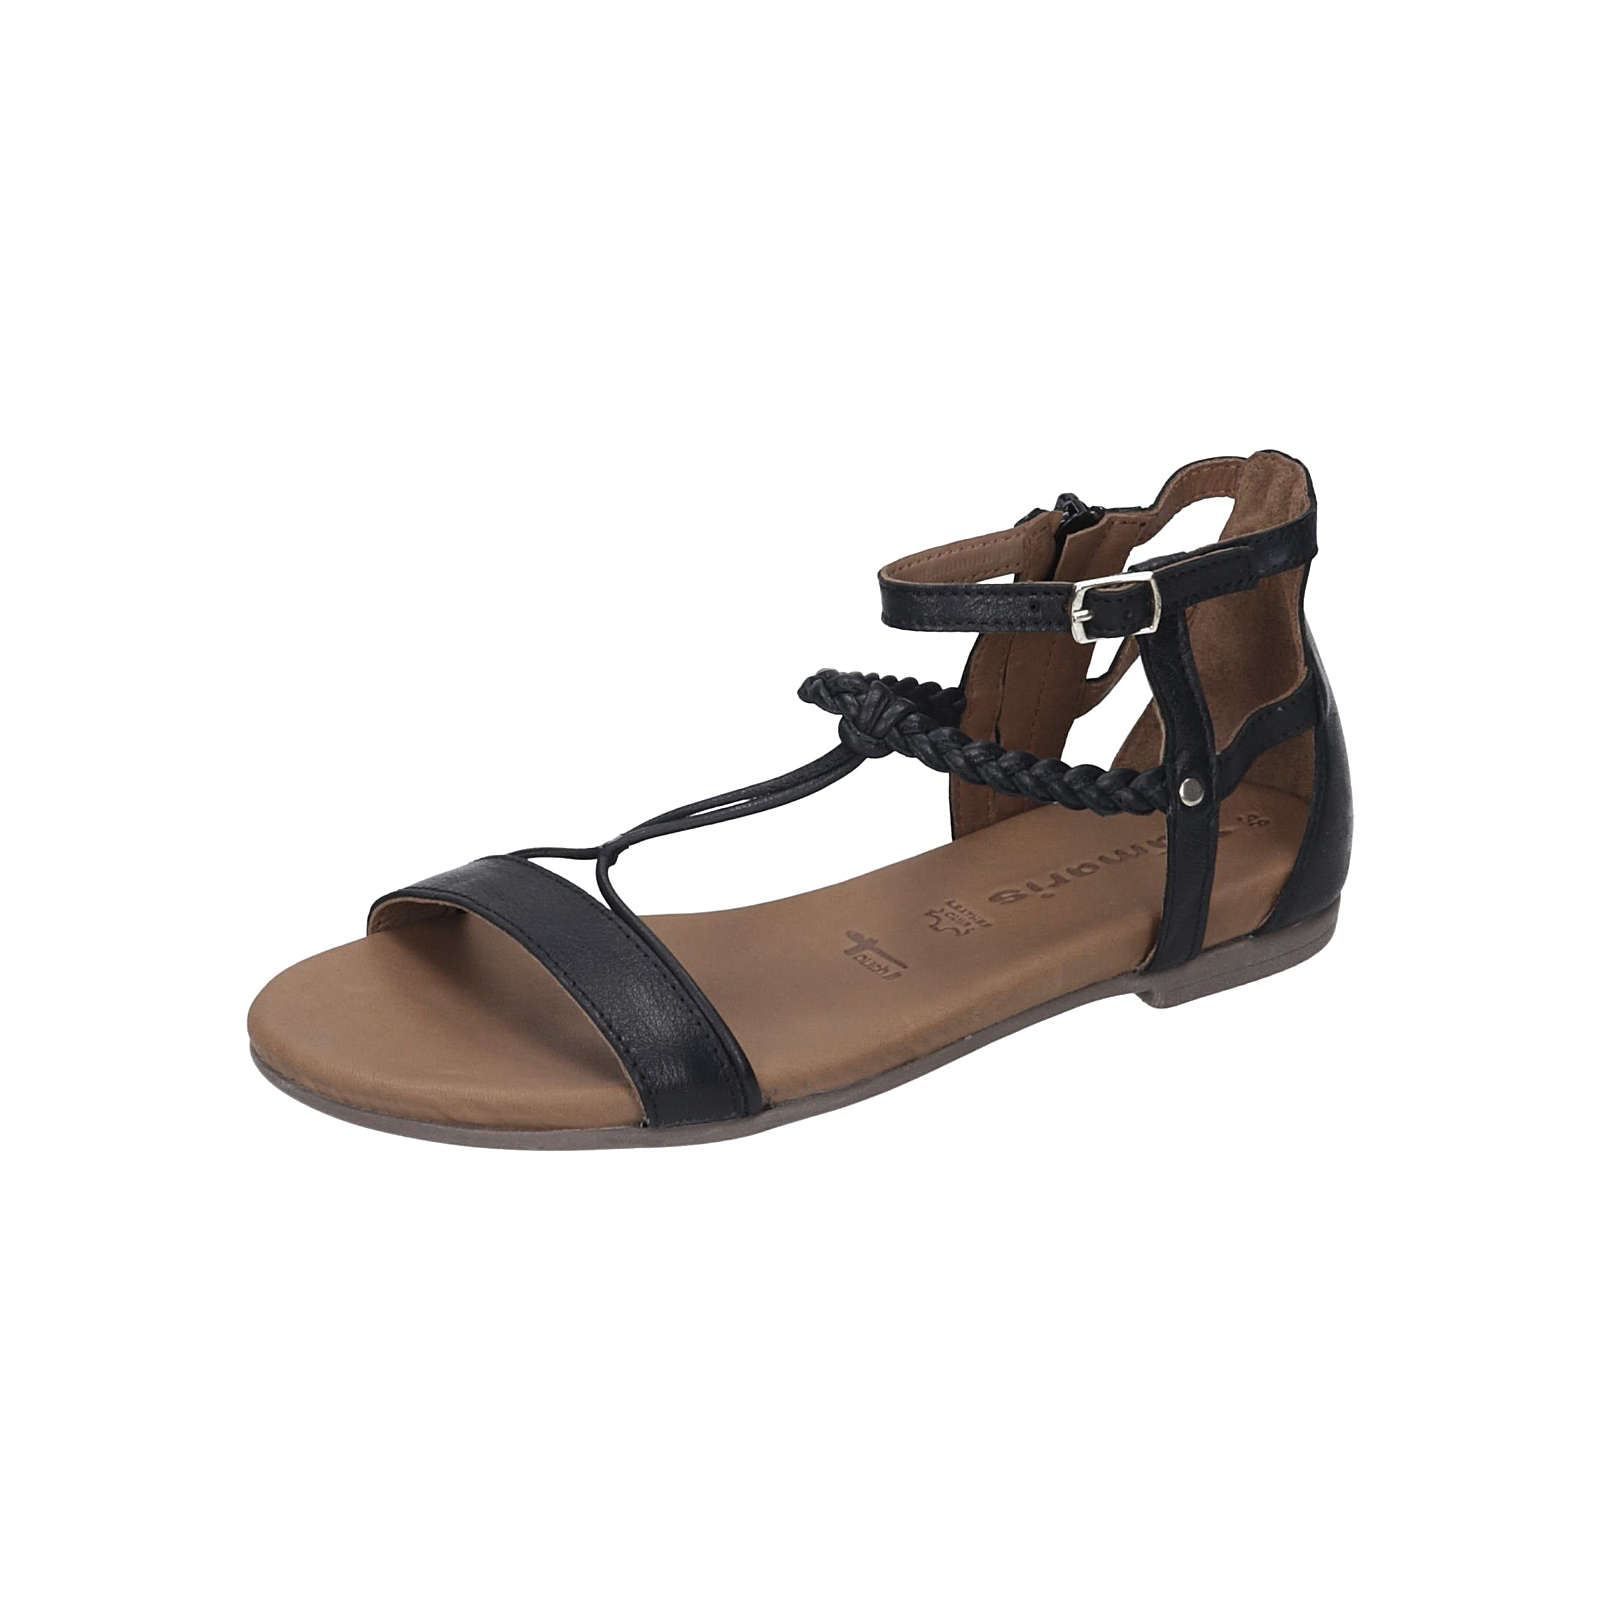 Tamaris Damen Sandalette T-Steg-Sandalen schwarz Damen Gr. 41